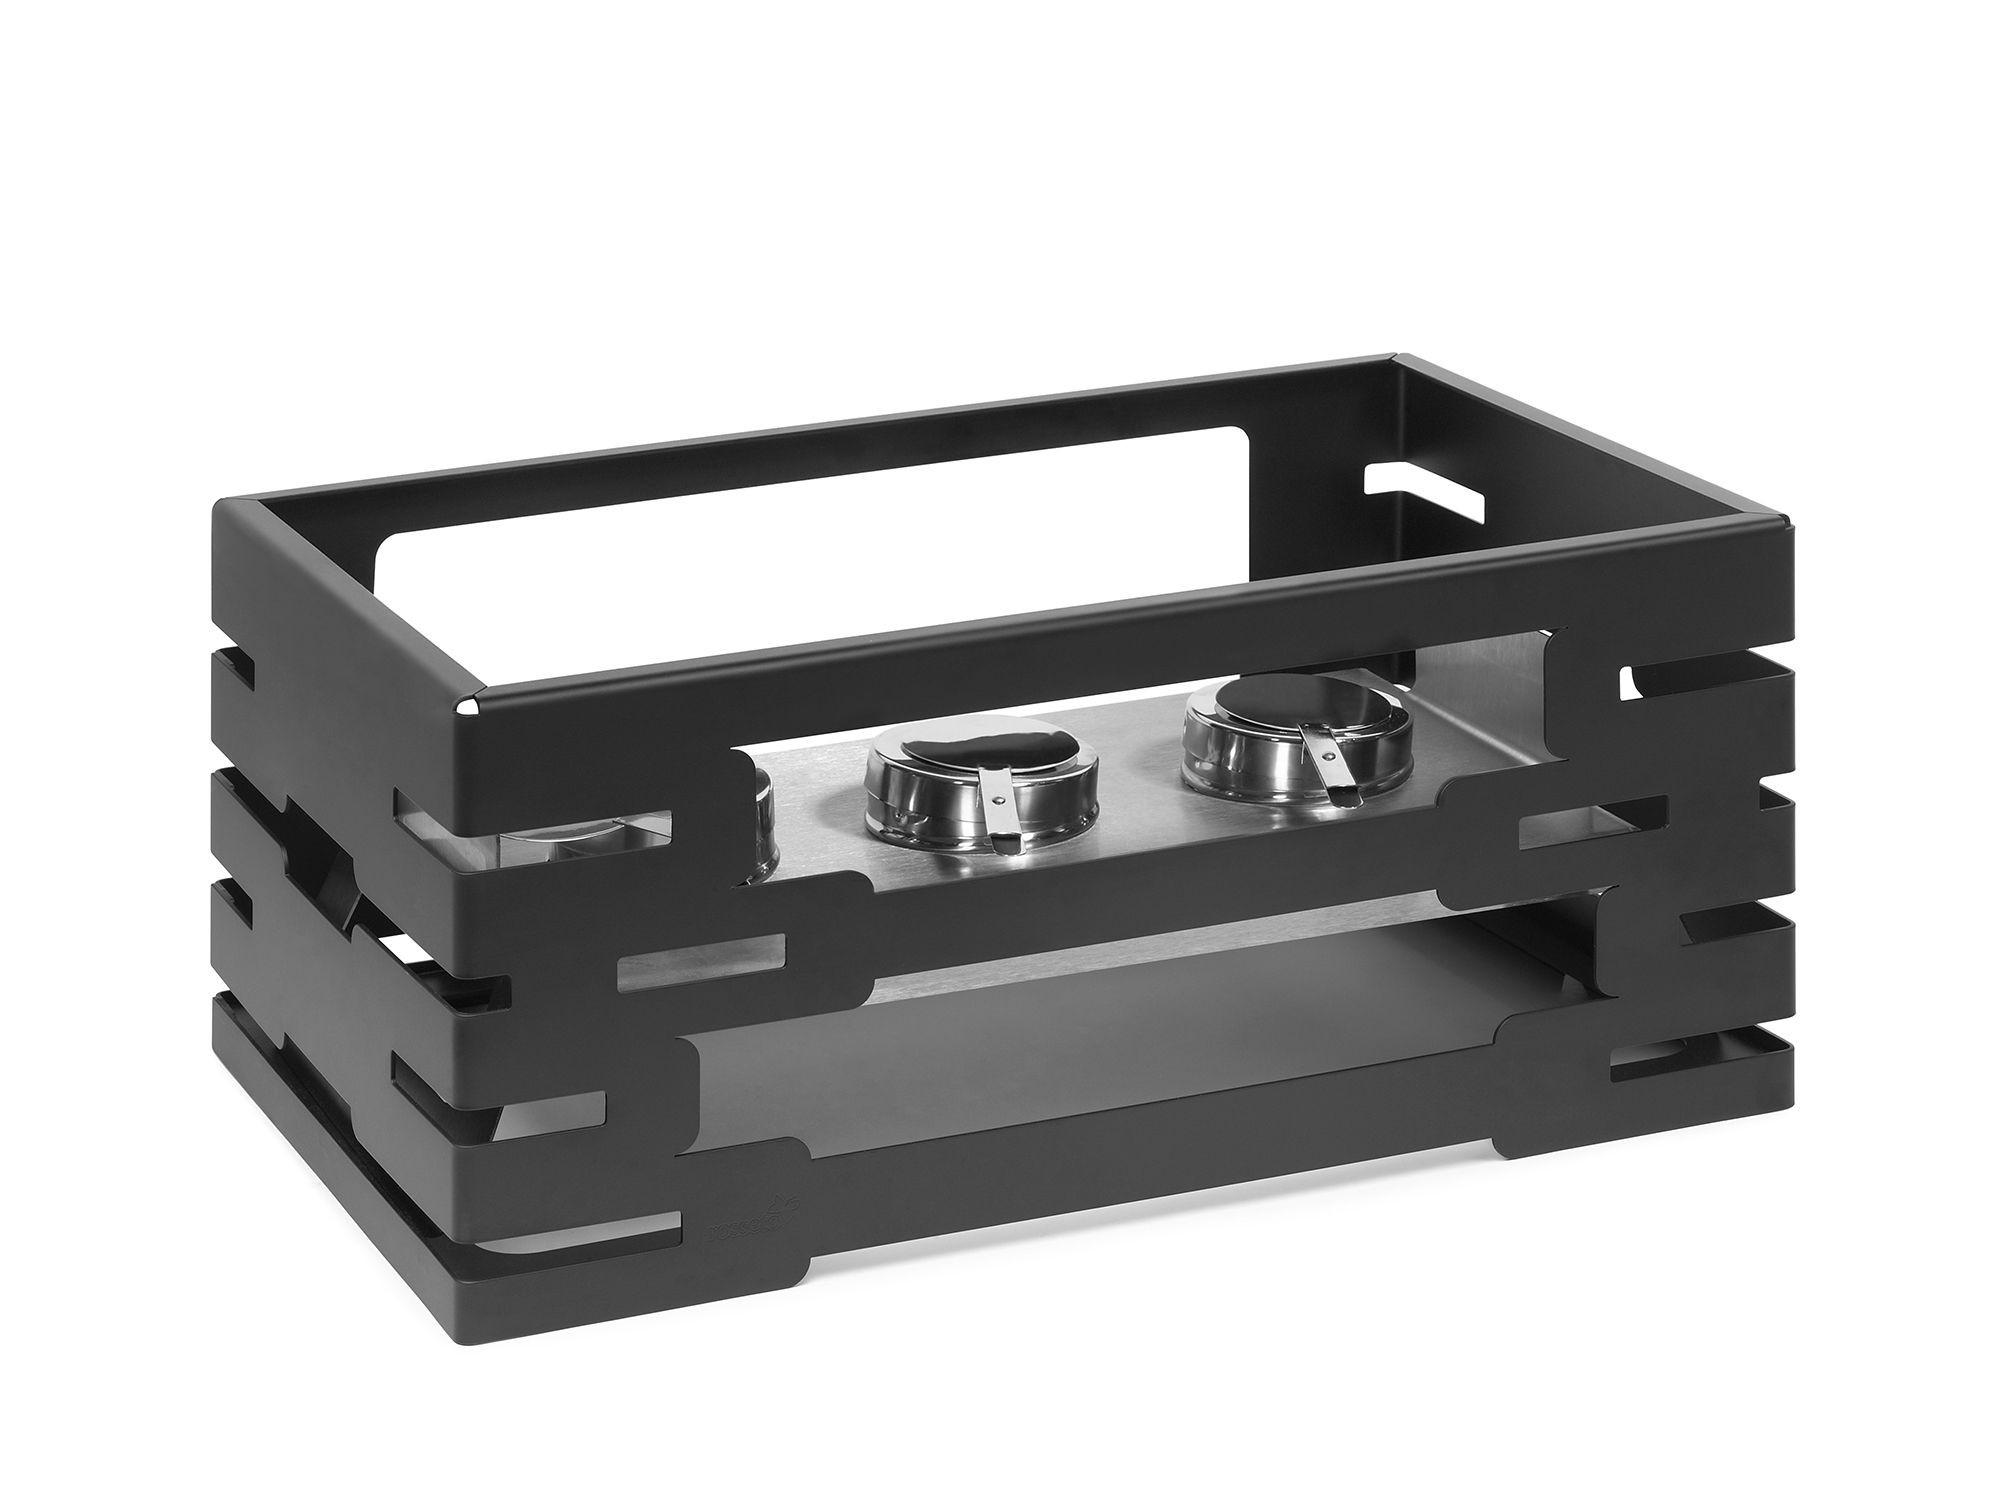 "Rosseto SM195 Multi-Chef™ 10"" Black Matte Steel Warmer with Burner Holder 21.6"" x 13.57"" x 10""H"